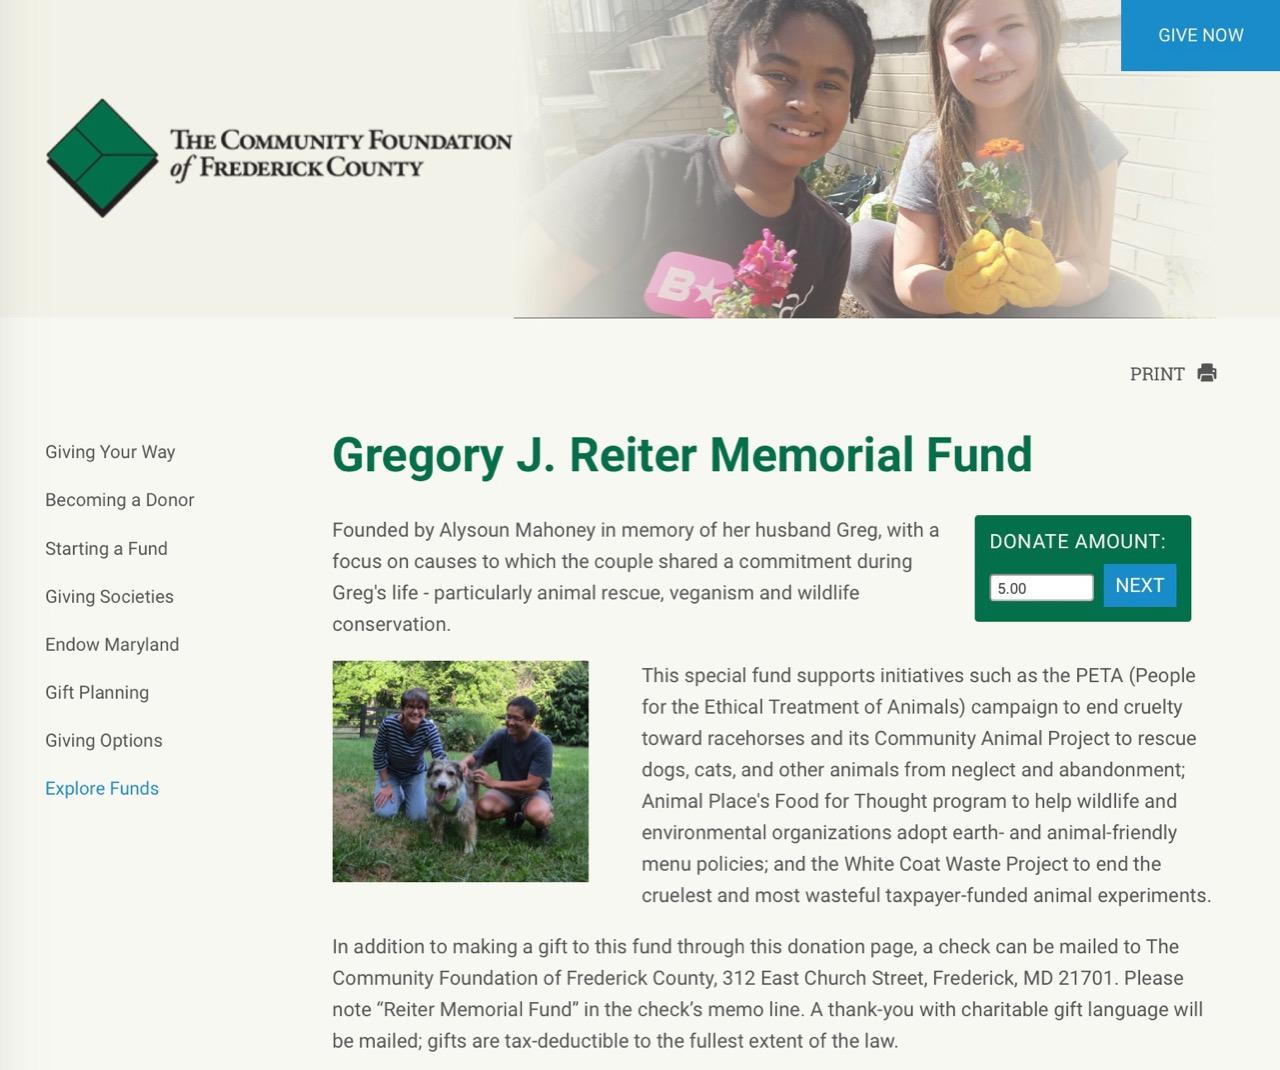 Frederick Community Foundation Donate Page